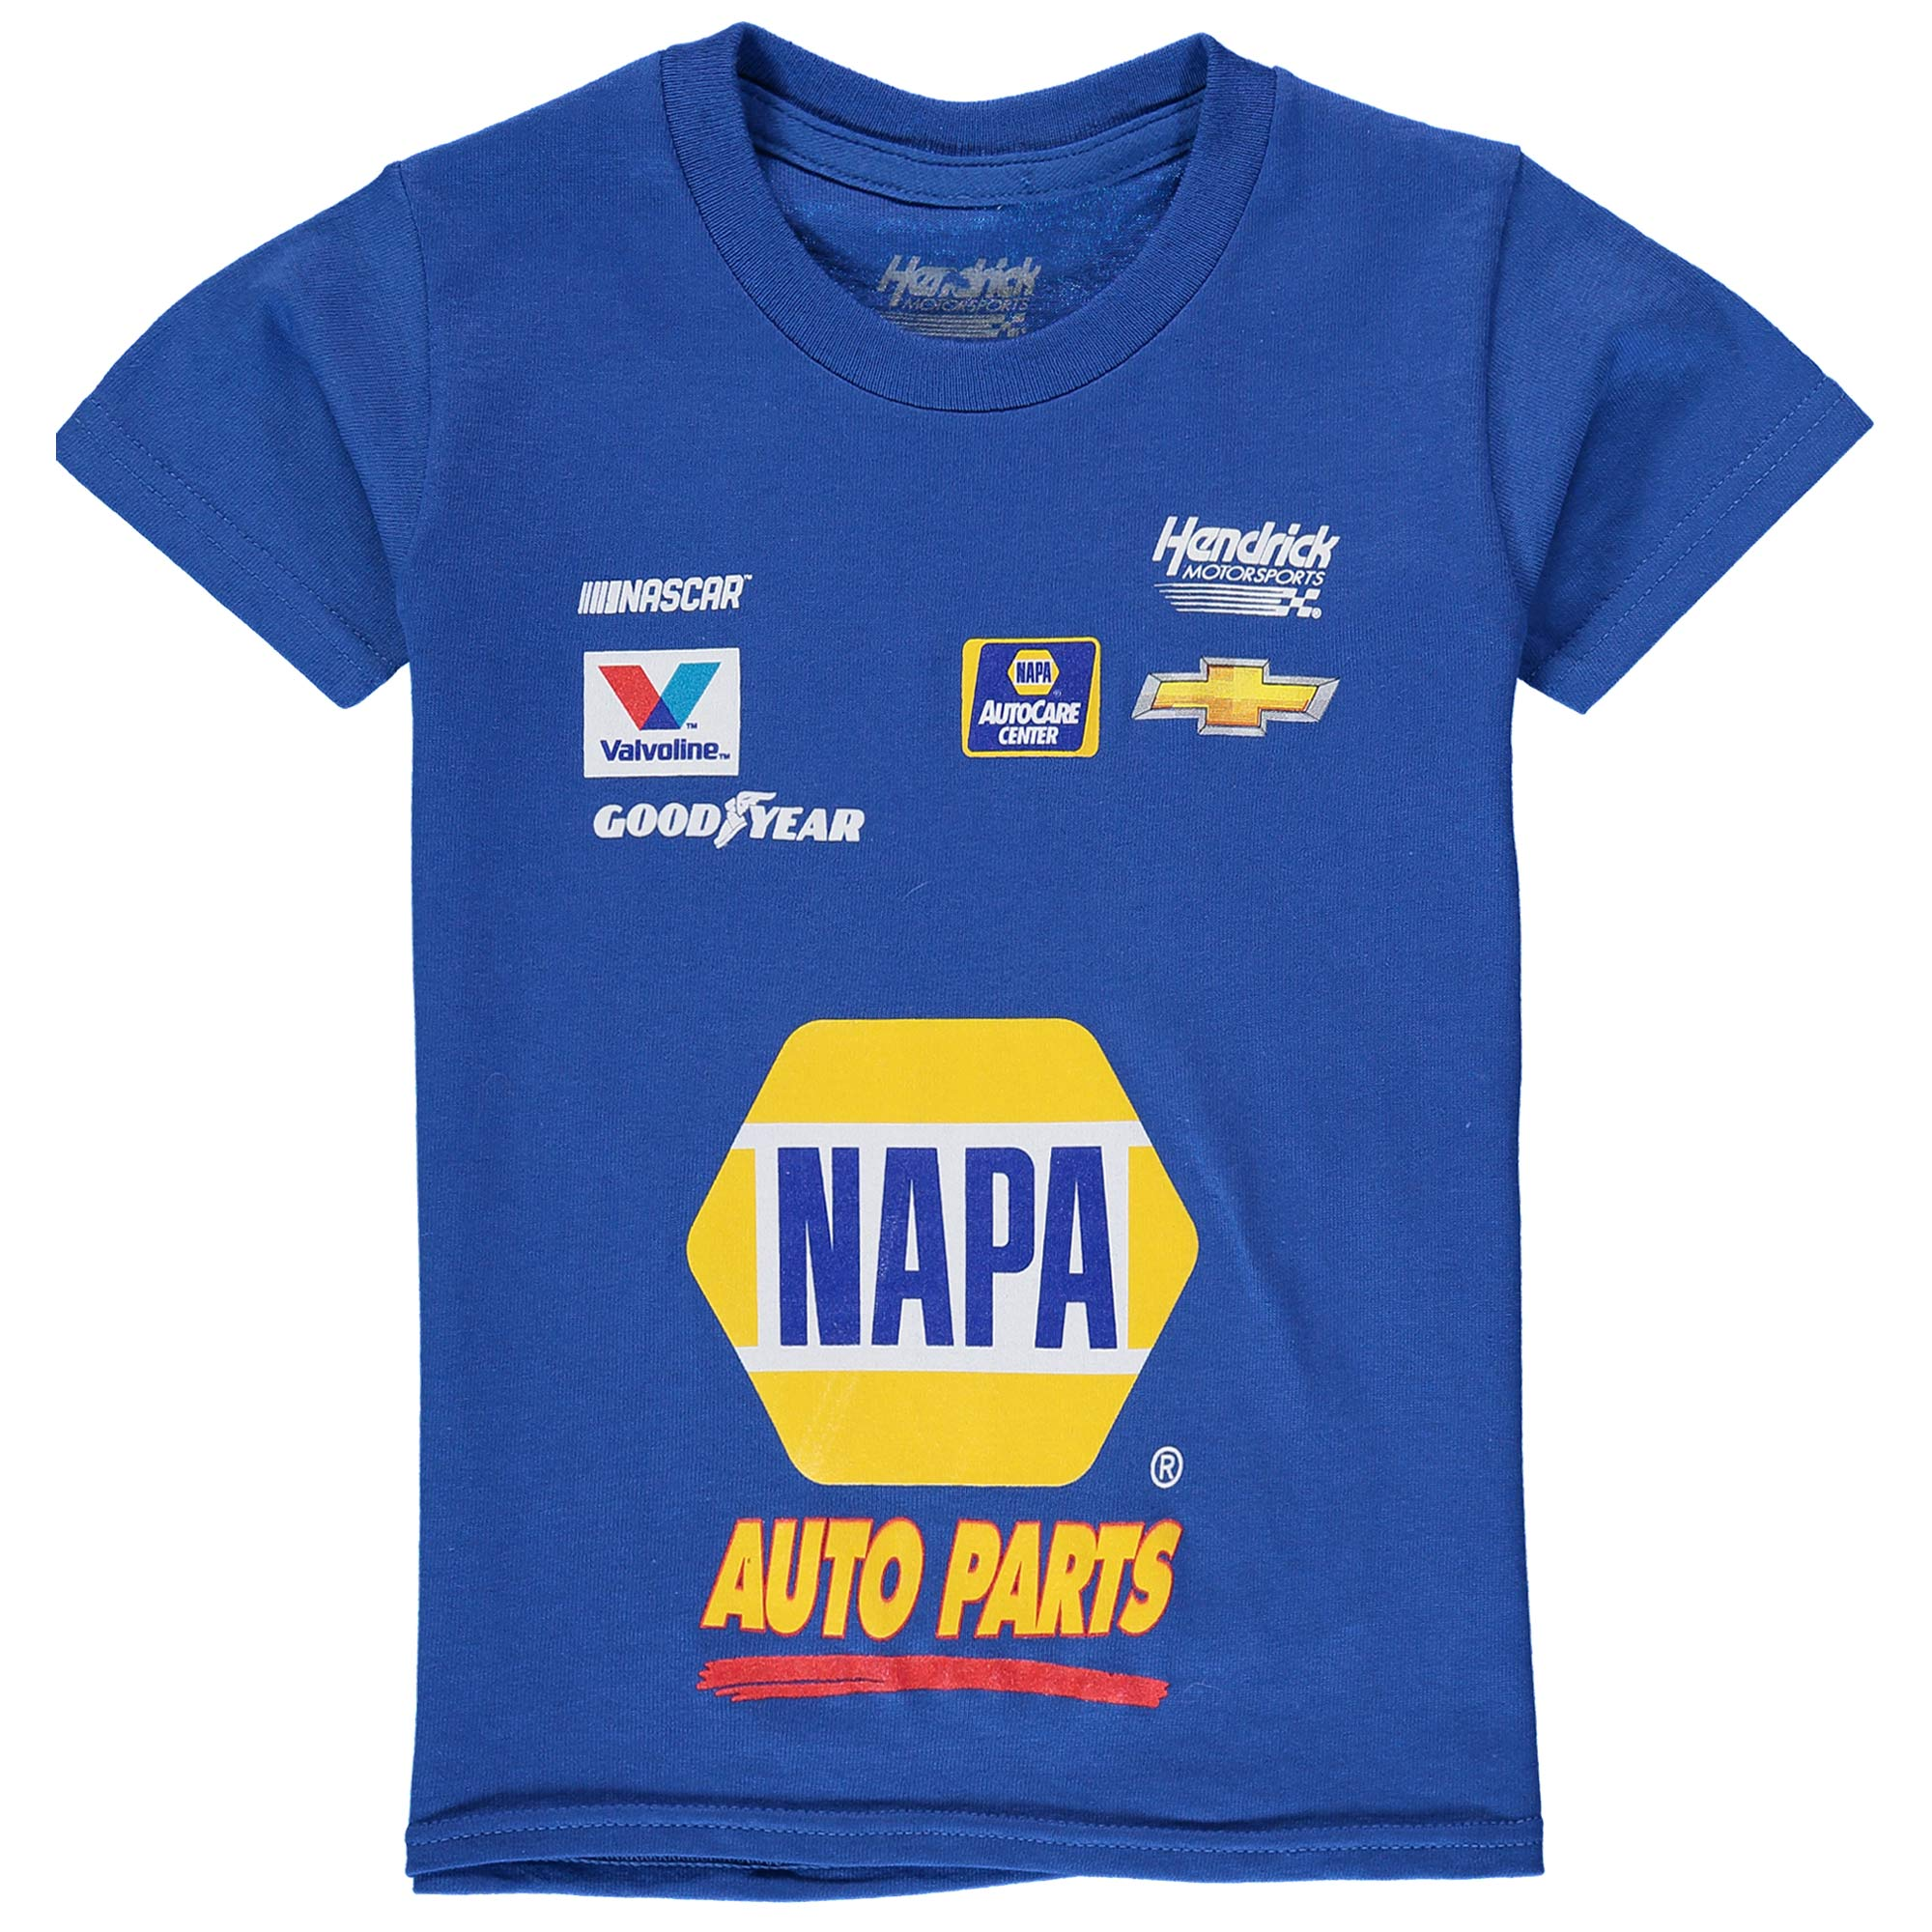 Chase Elliott Hendrick Motorsports Team Collection Youth NAPA Uniform T-Shirt - Royal